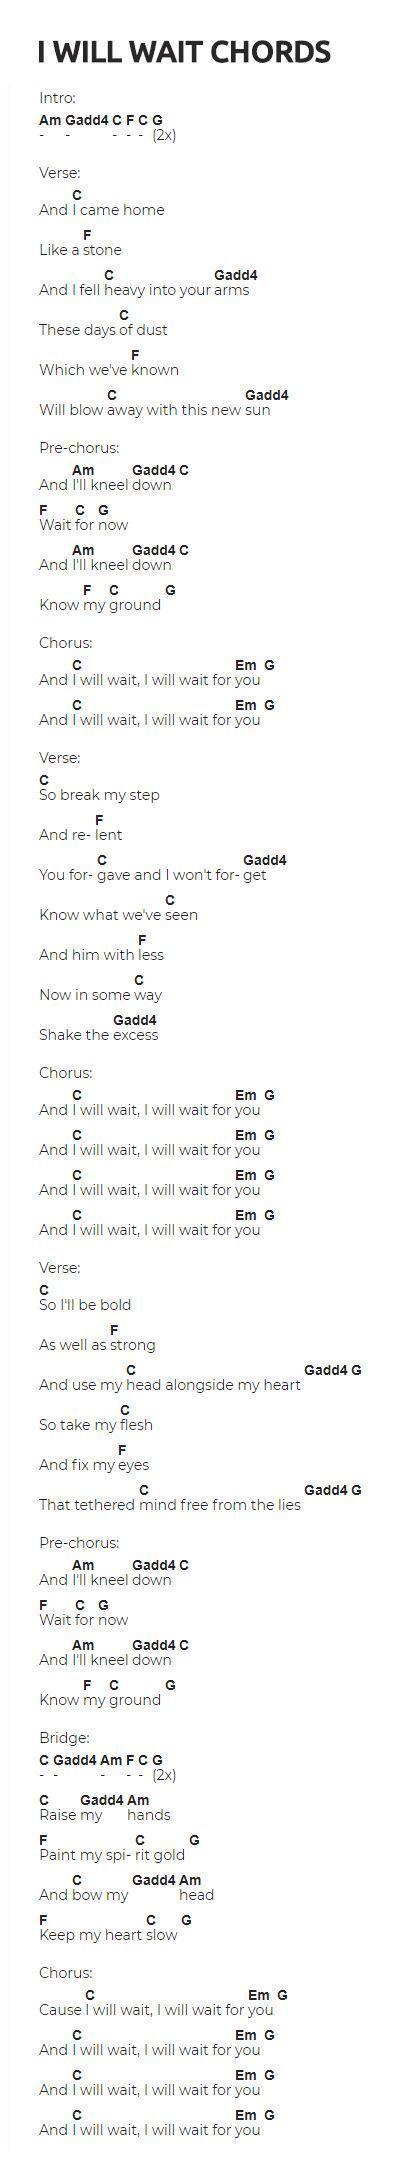 Songs like i will wait